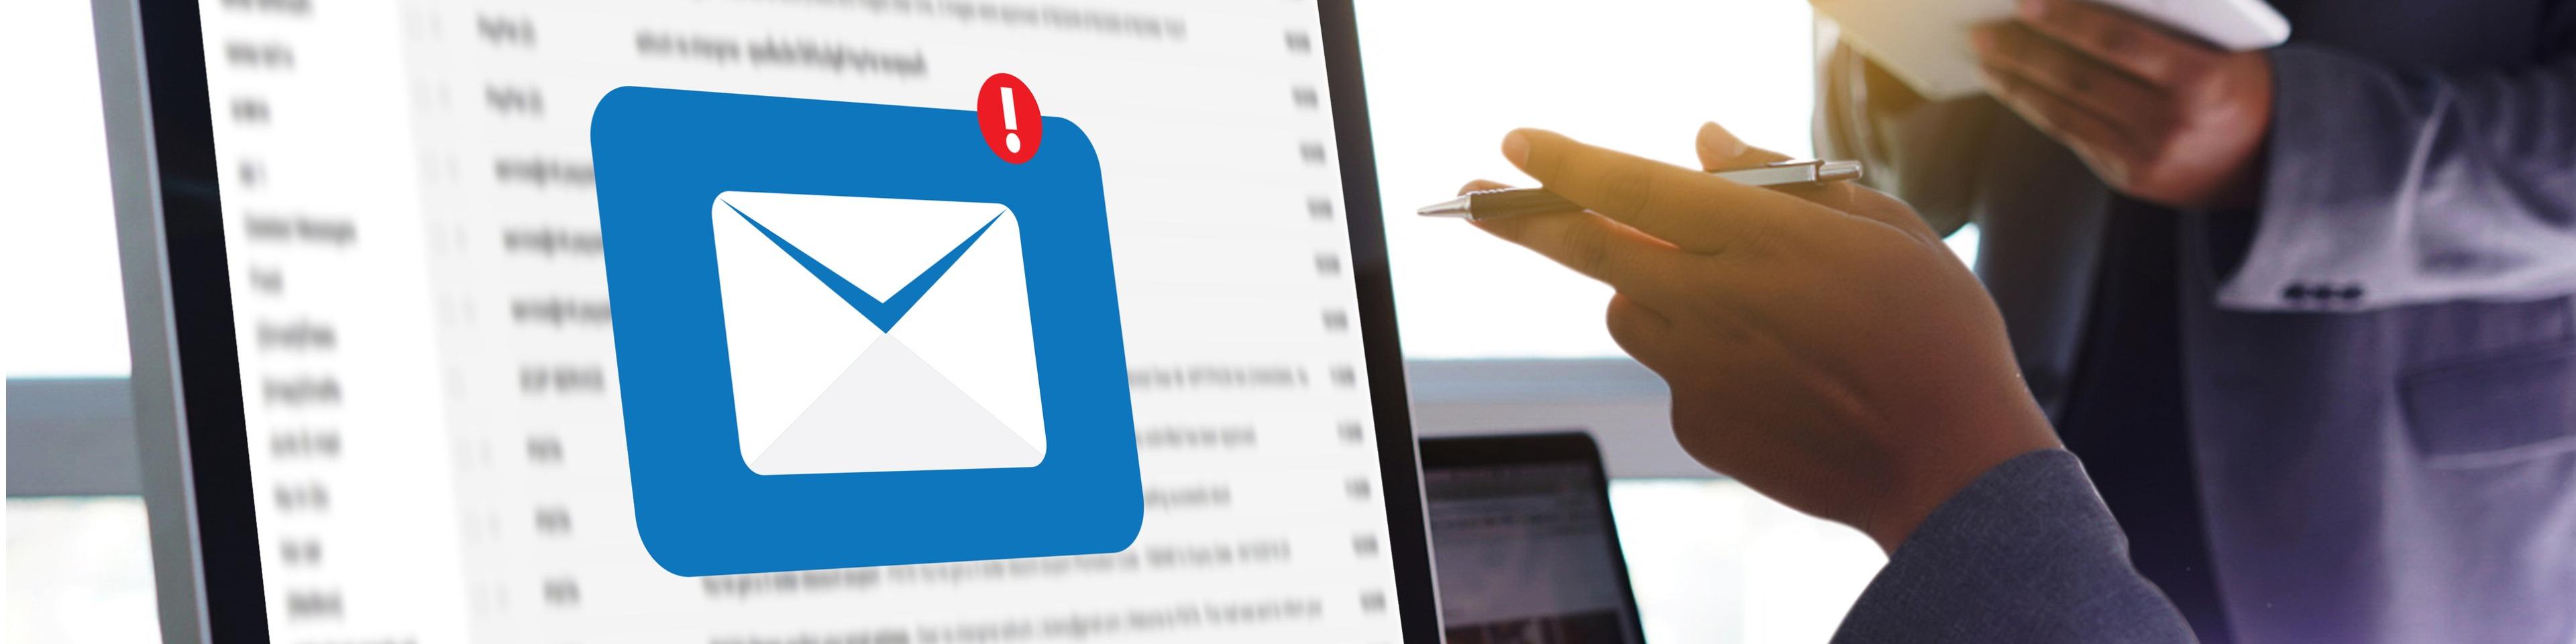 e-mail te mijden